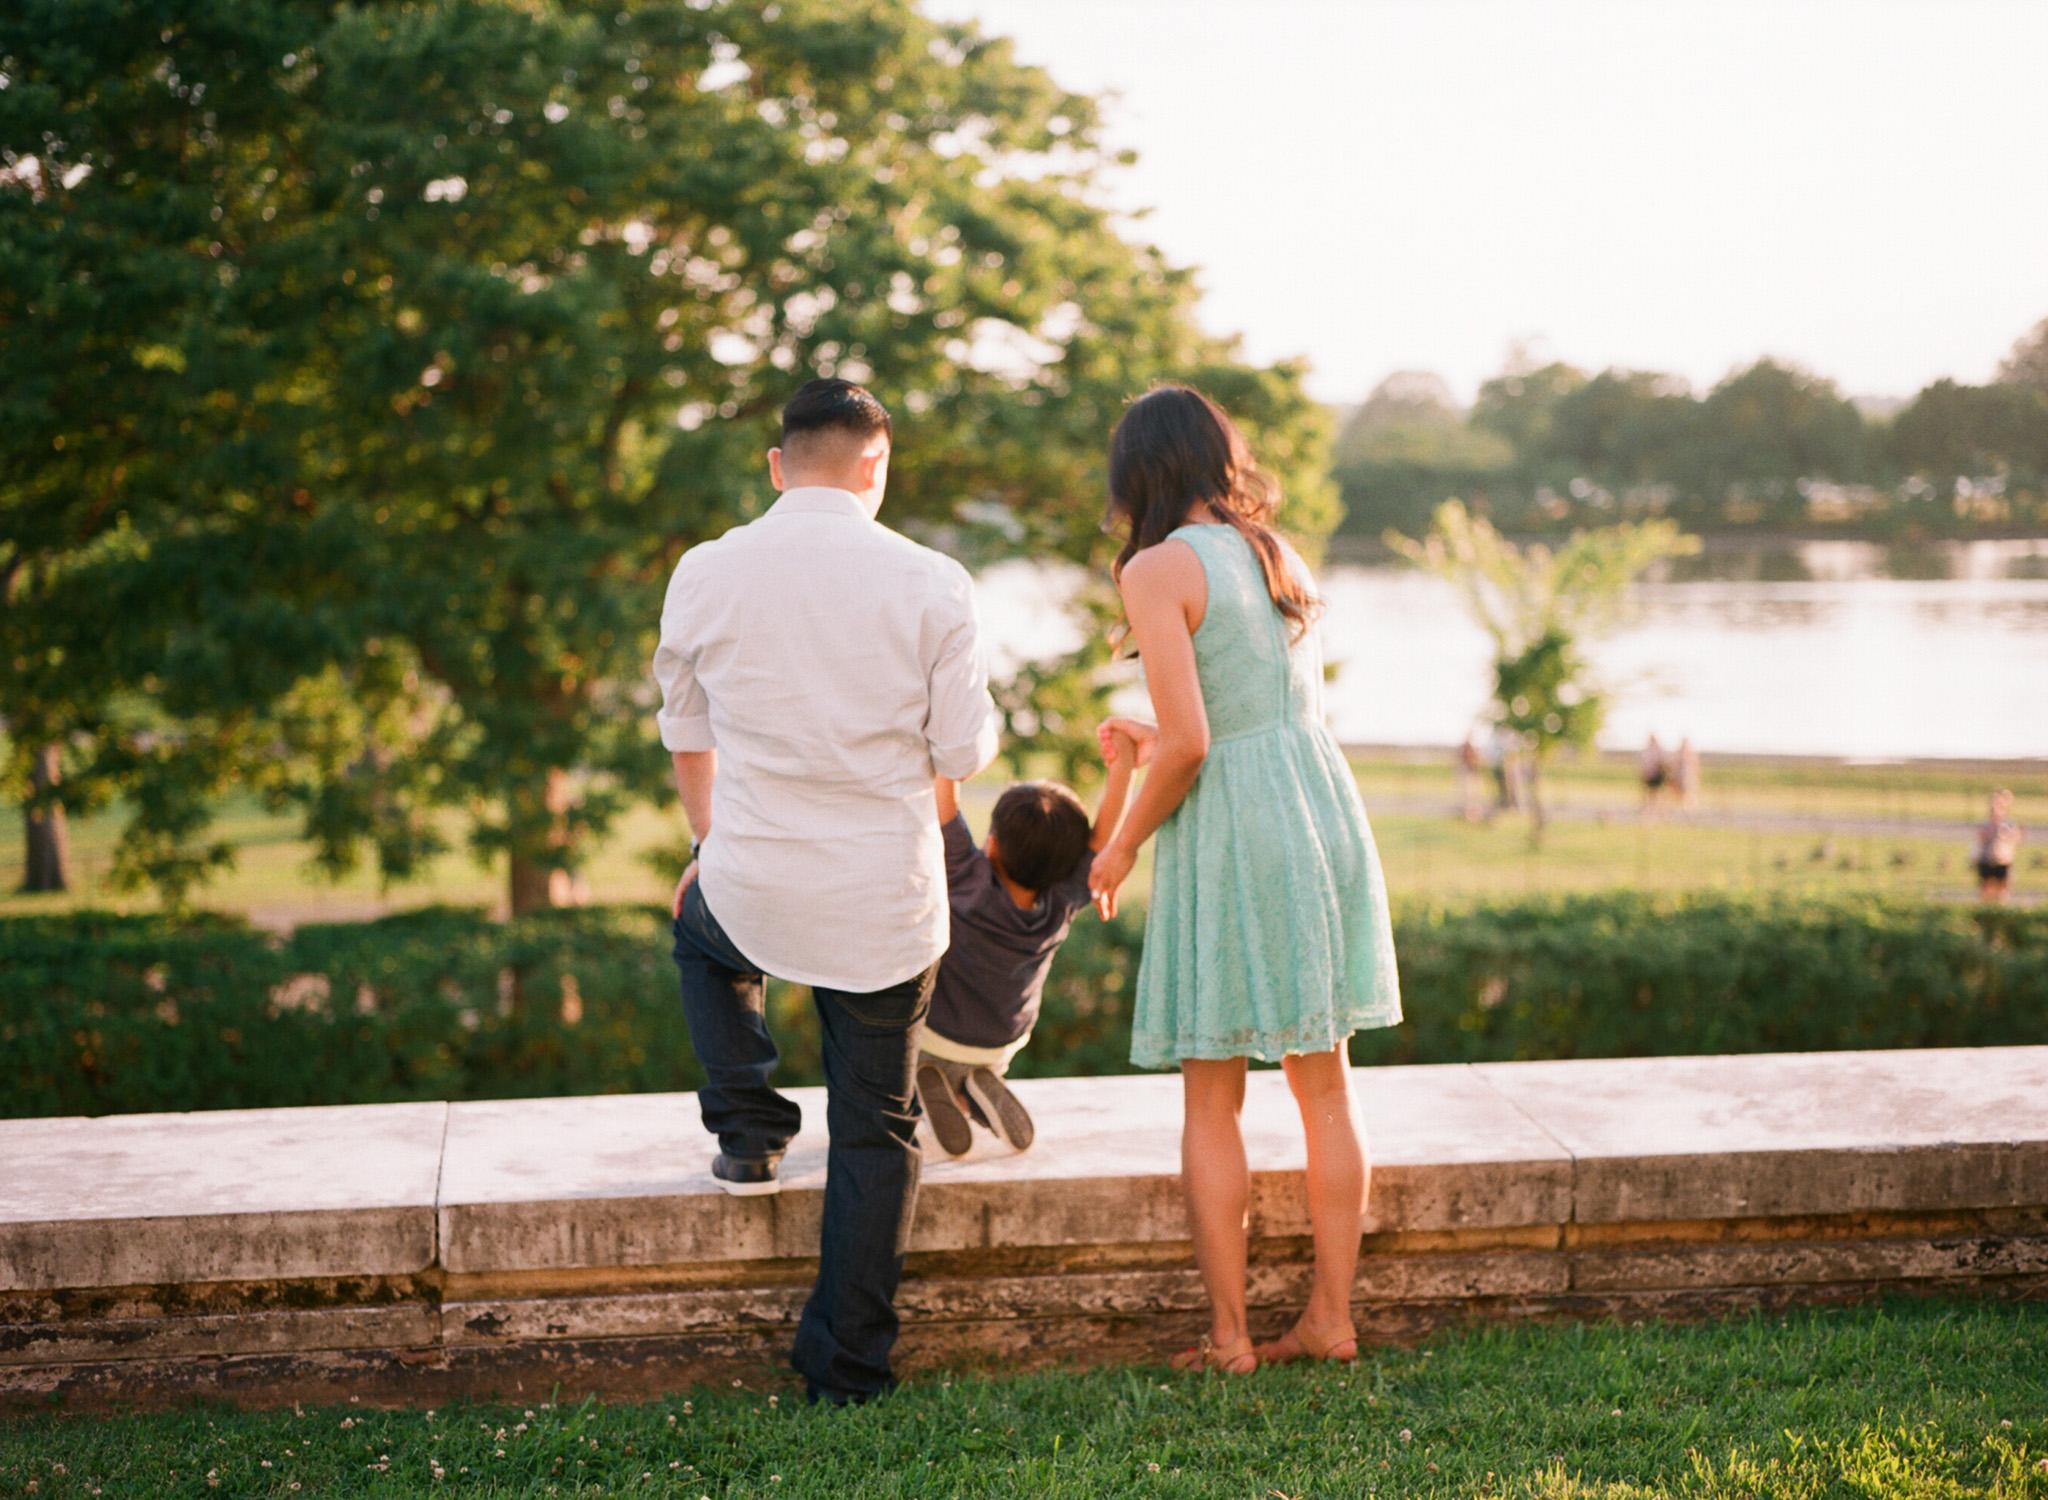 Jefferson-Memorial-Portrait-Photographer-21.jpg